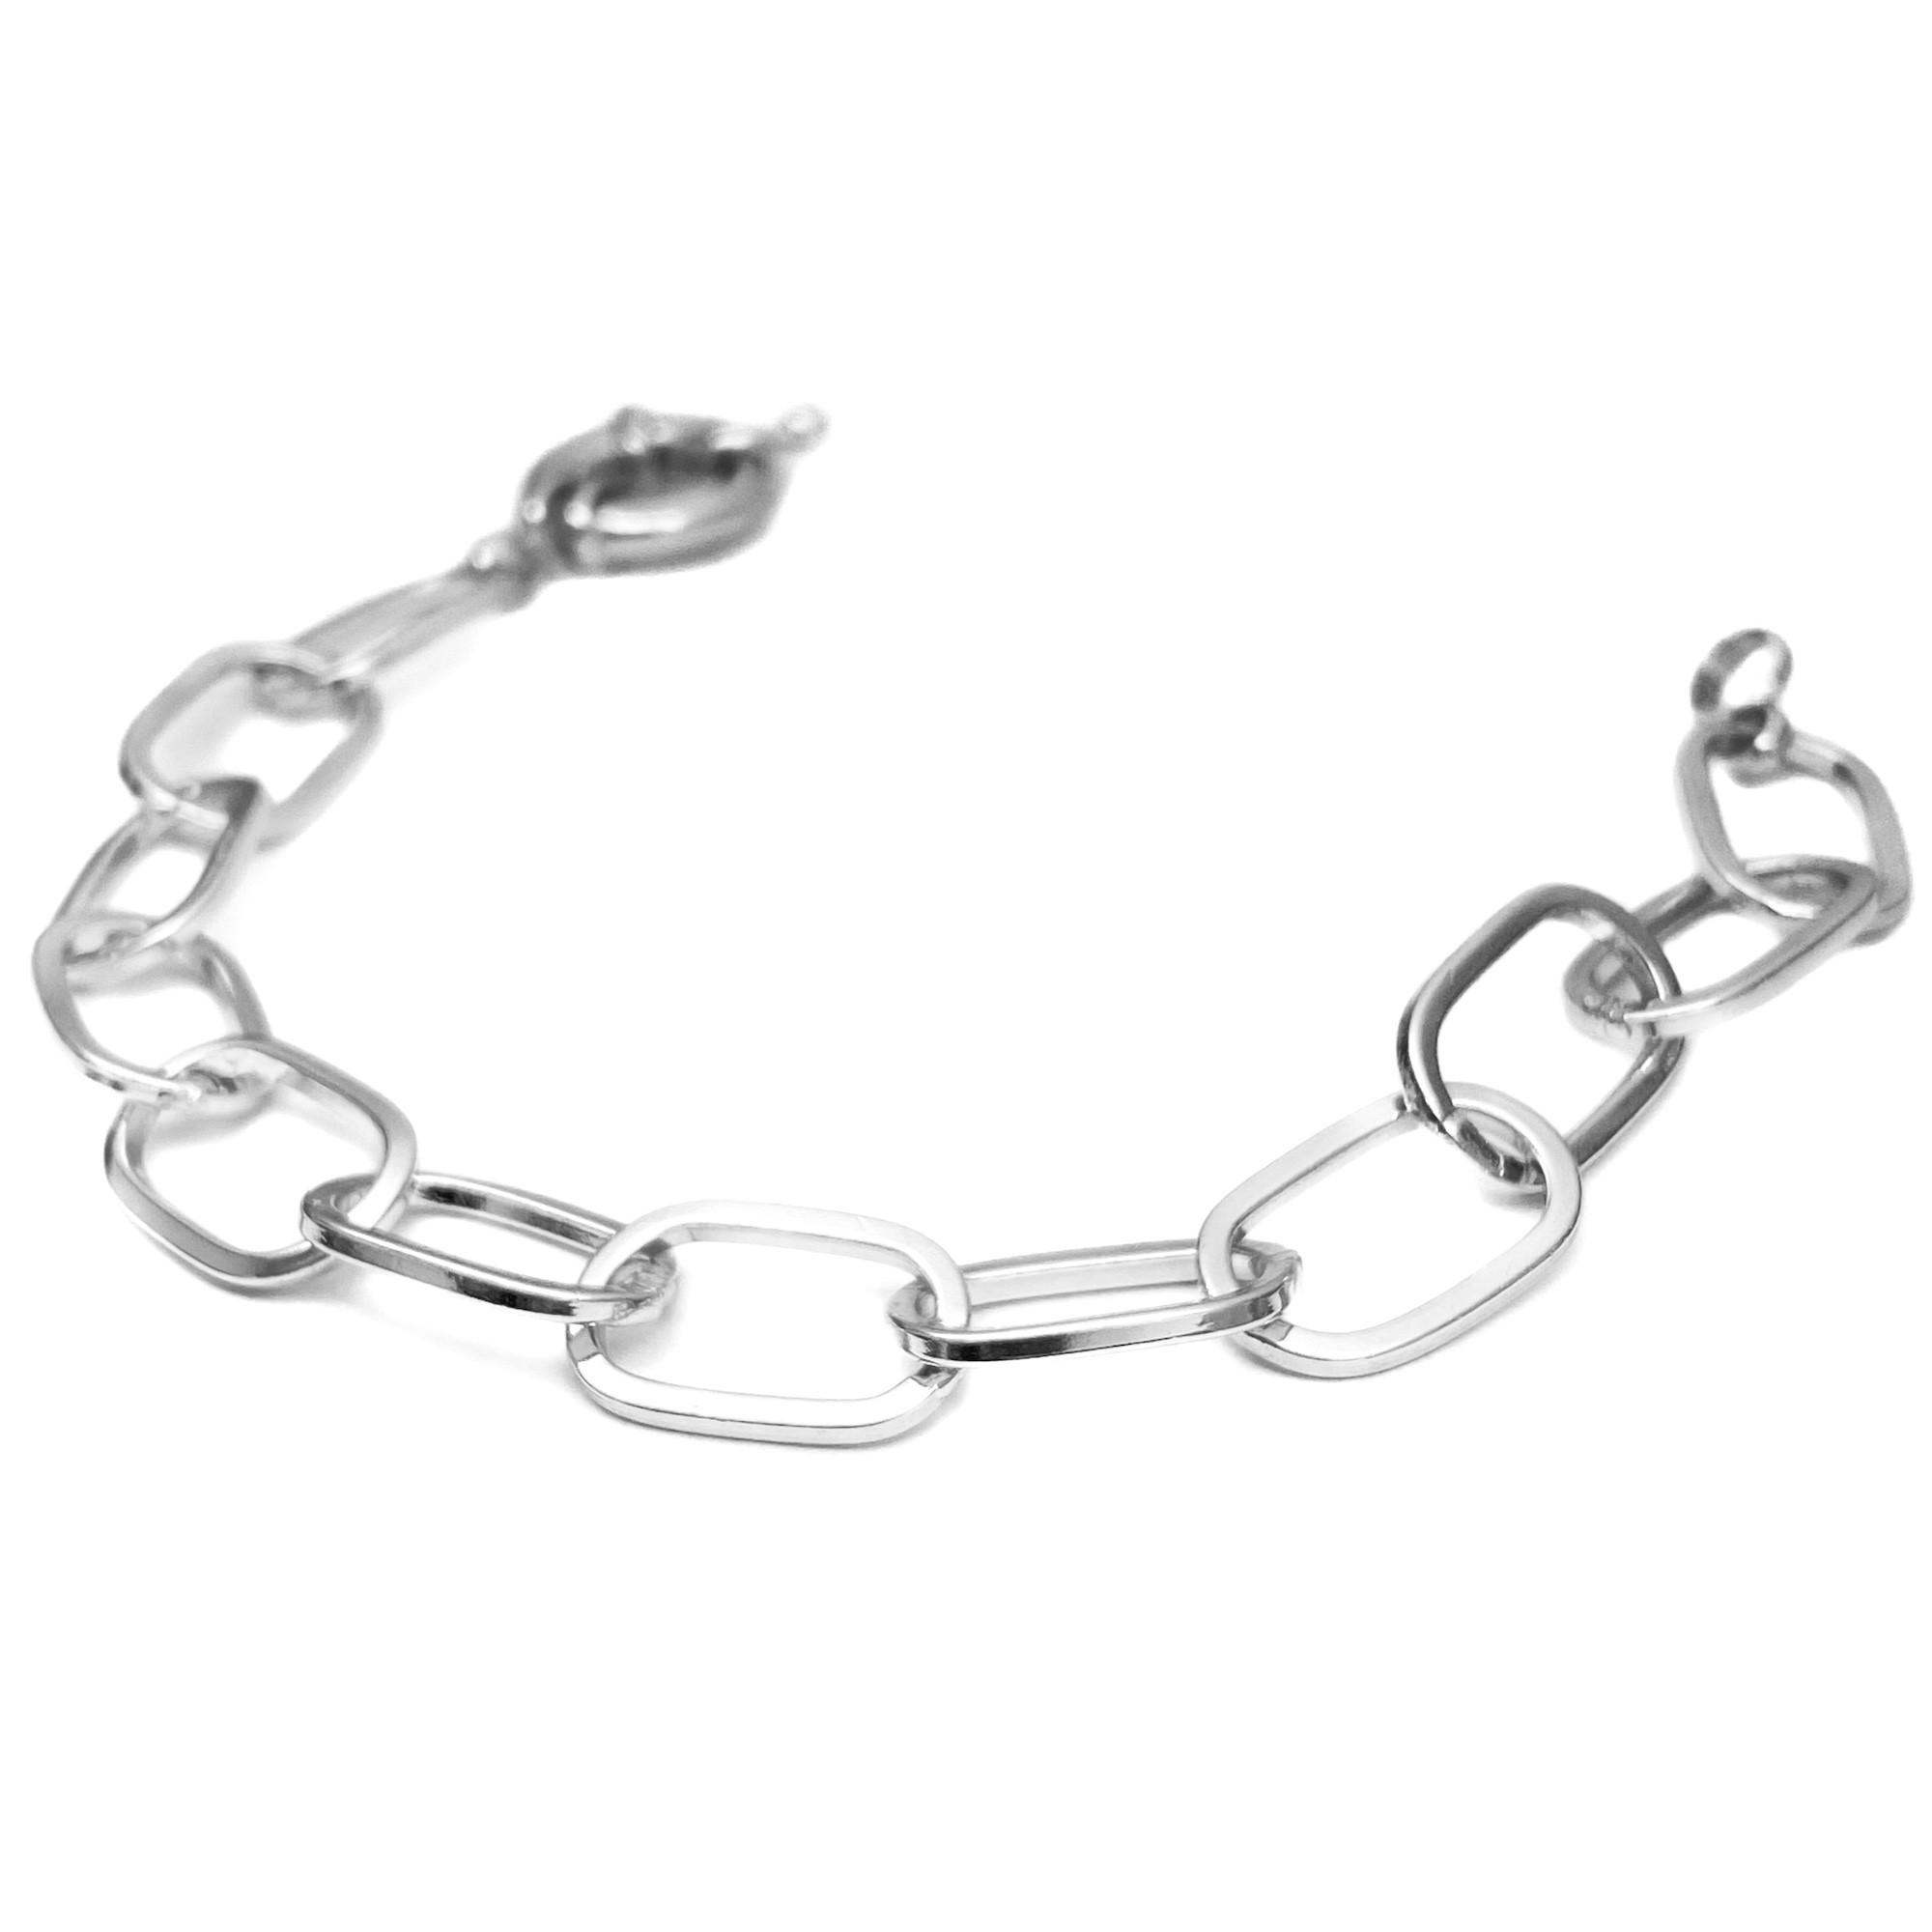 Pulseira Chain Elos Fecho Boia (Banho Prata 925)